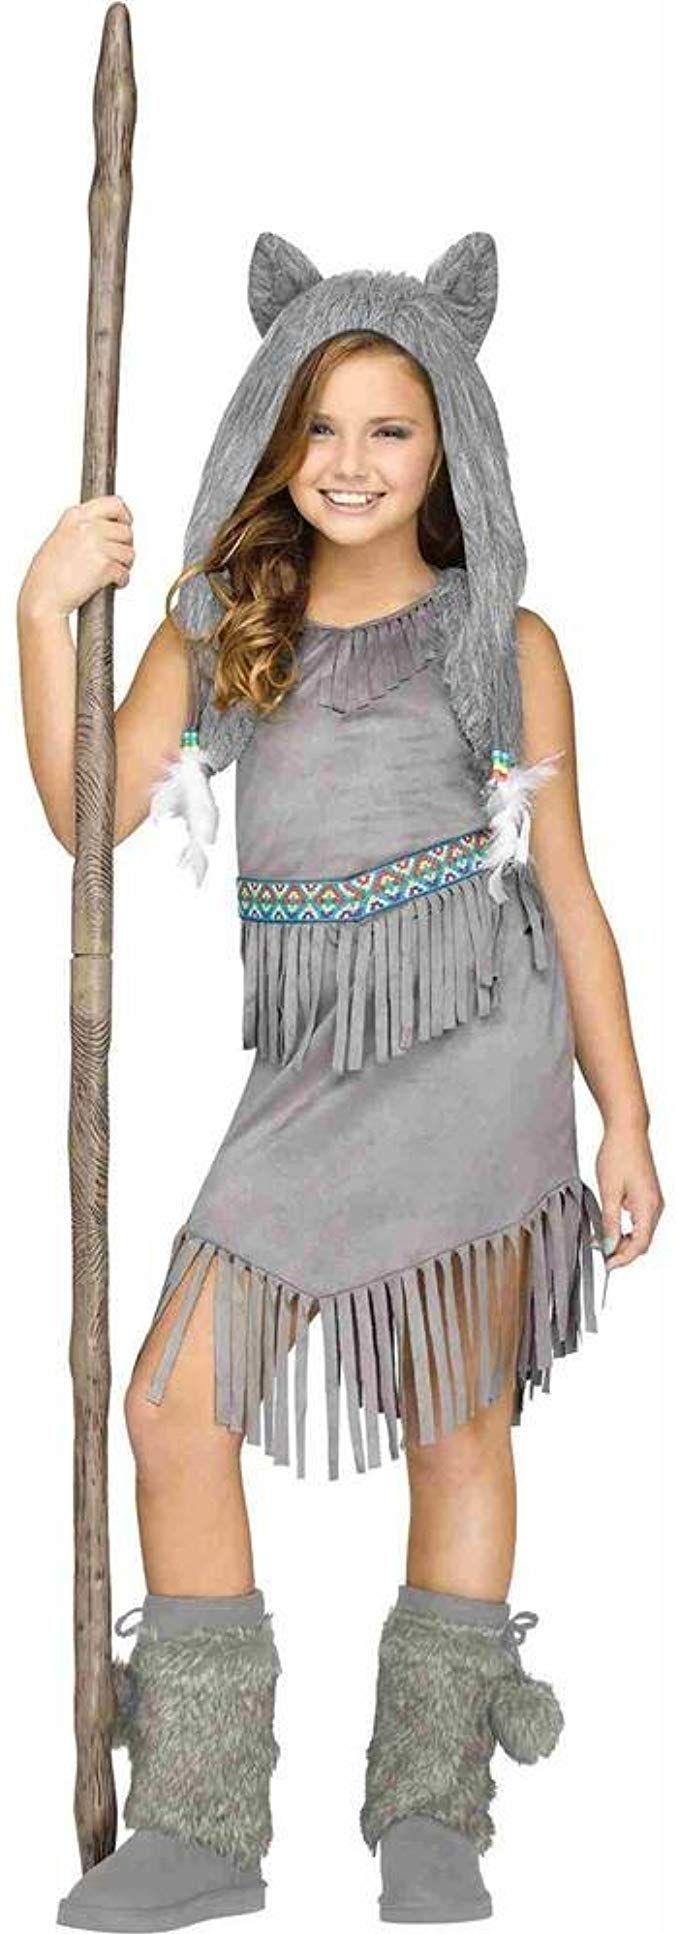 Fun World Tween Girls Halloween Costume Wolf